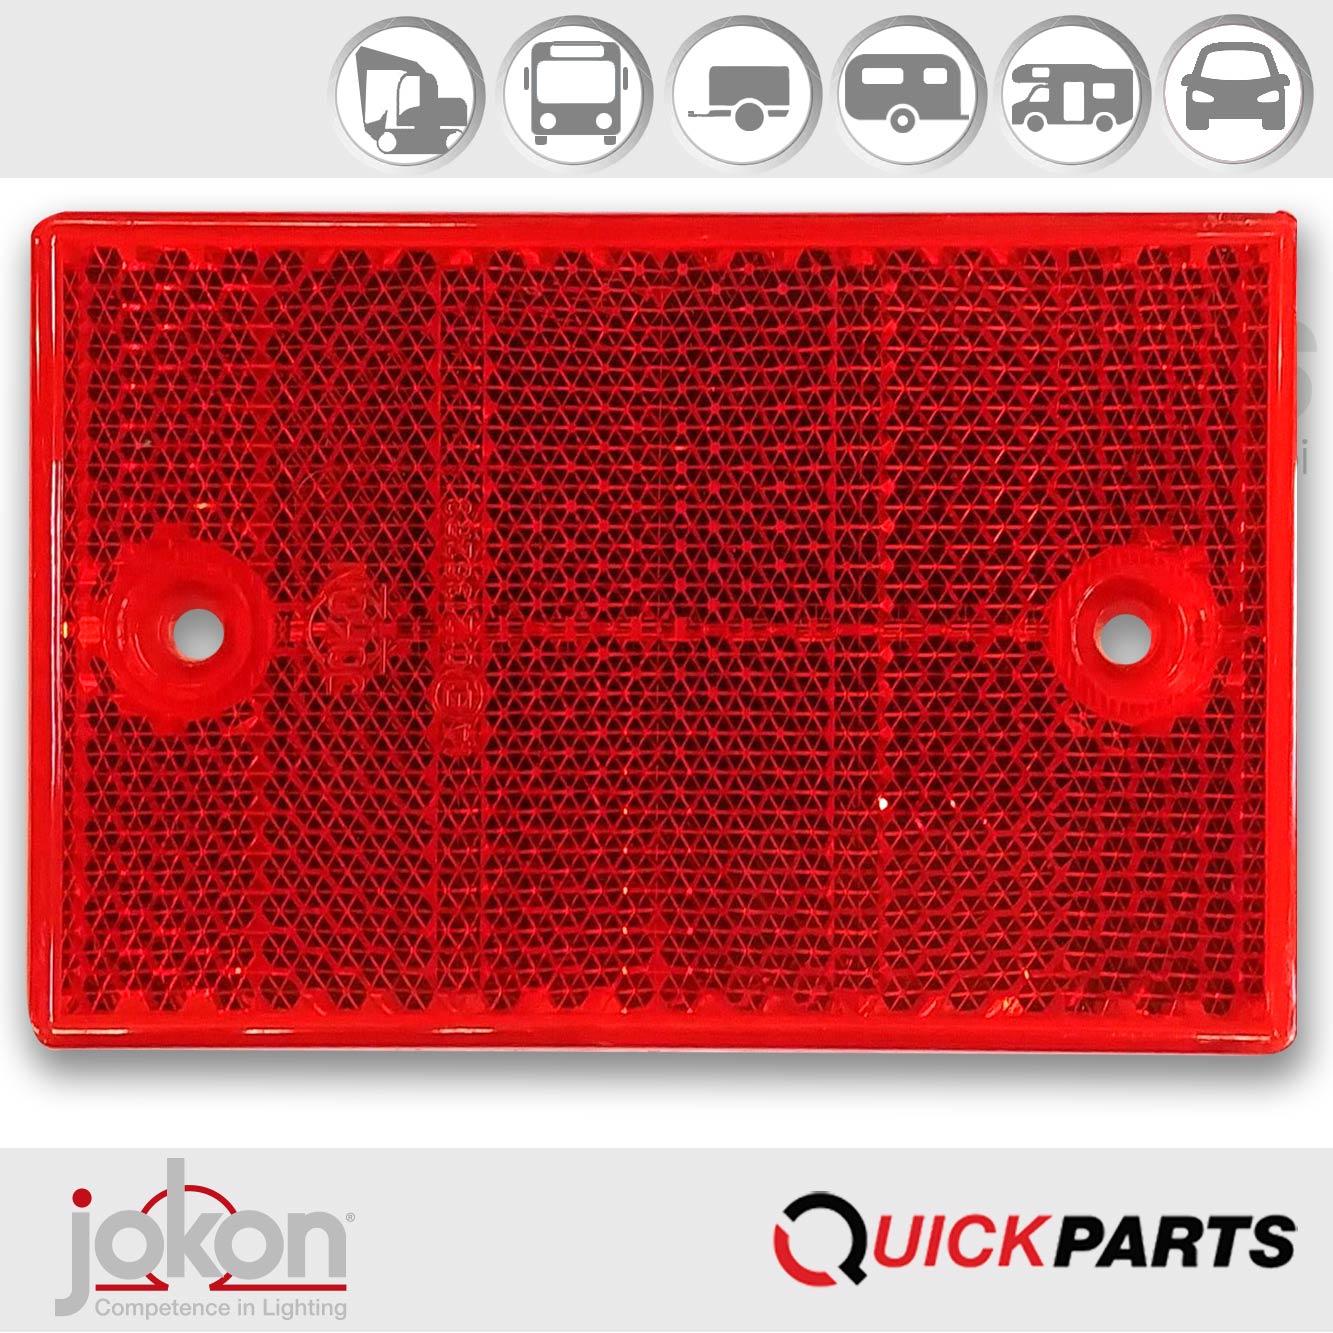 Red Reflex Reflector 115 x 7 x 75 mm